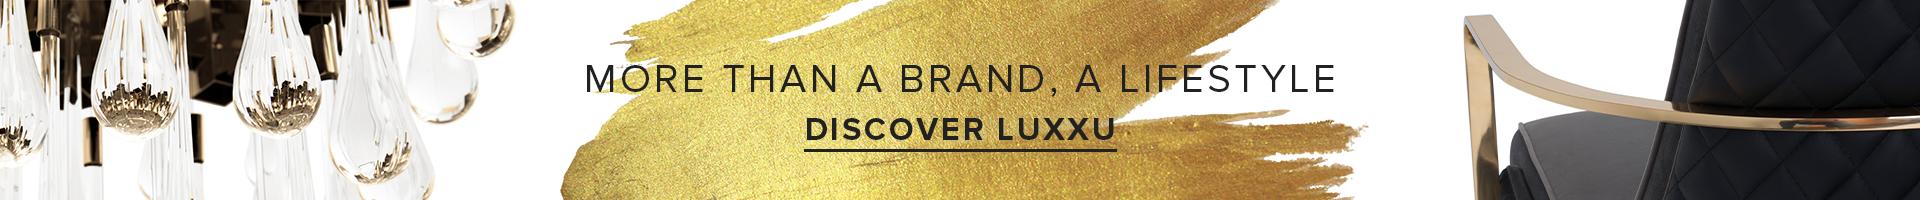 Luxxu Top Banner